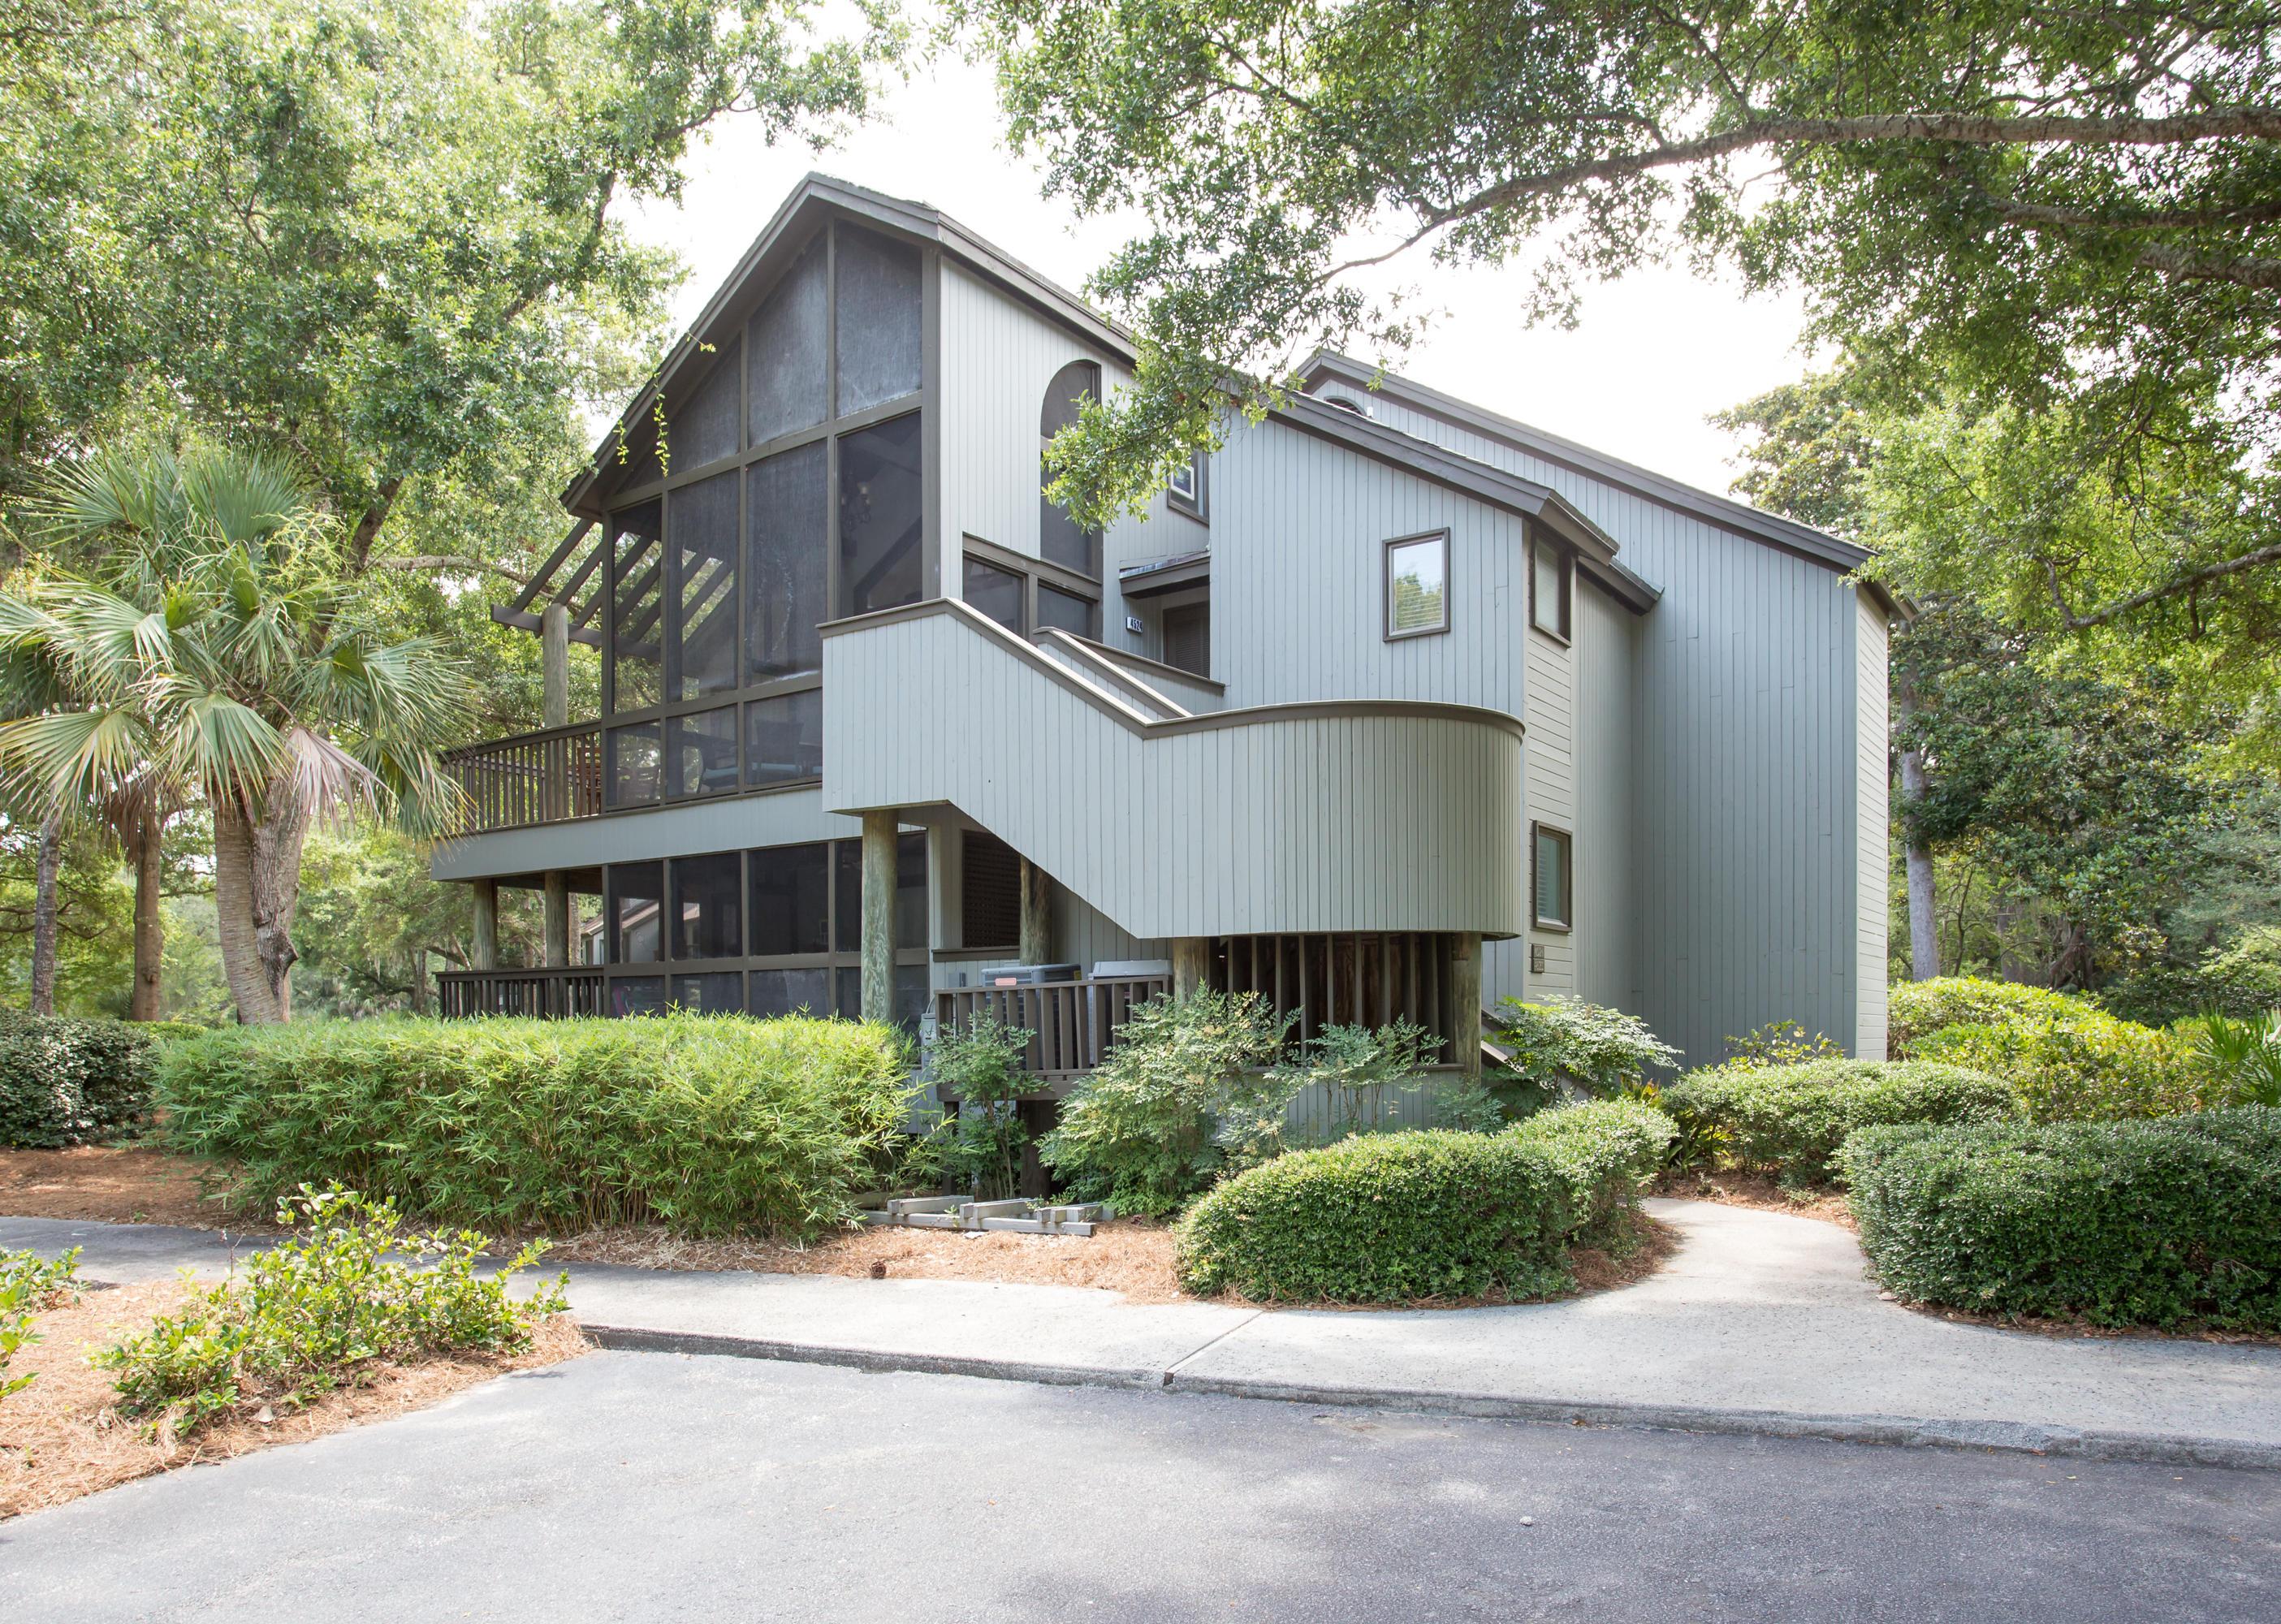 Kiawah Island Homes For Sale - 4523 Park Lake, Kiawah Island, SC - 6